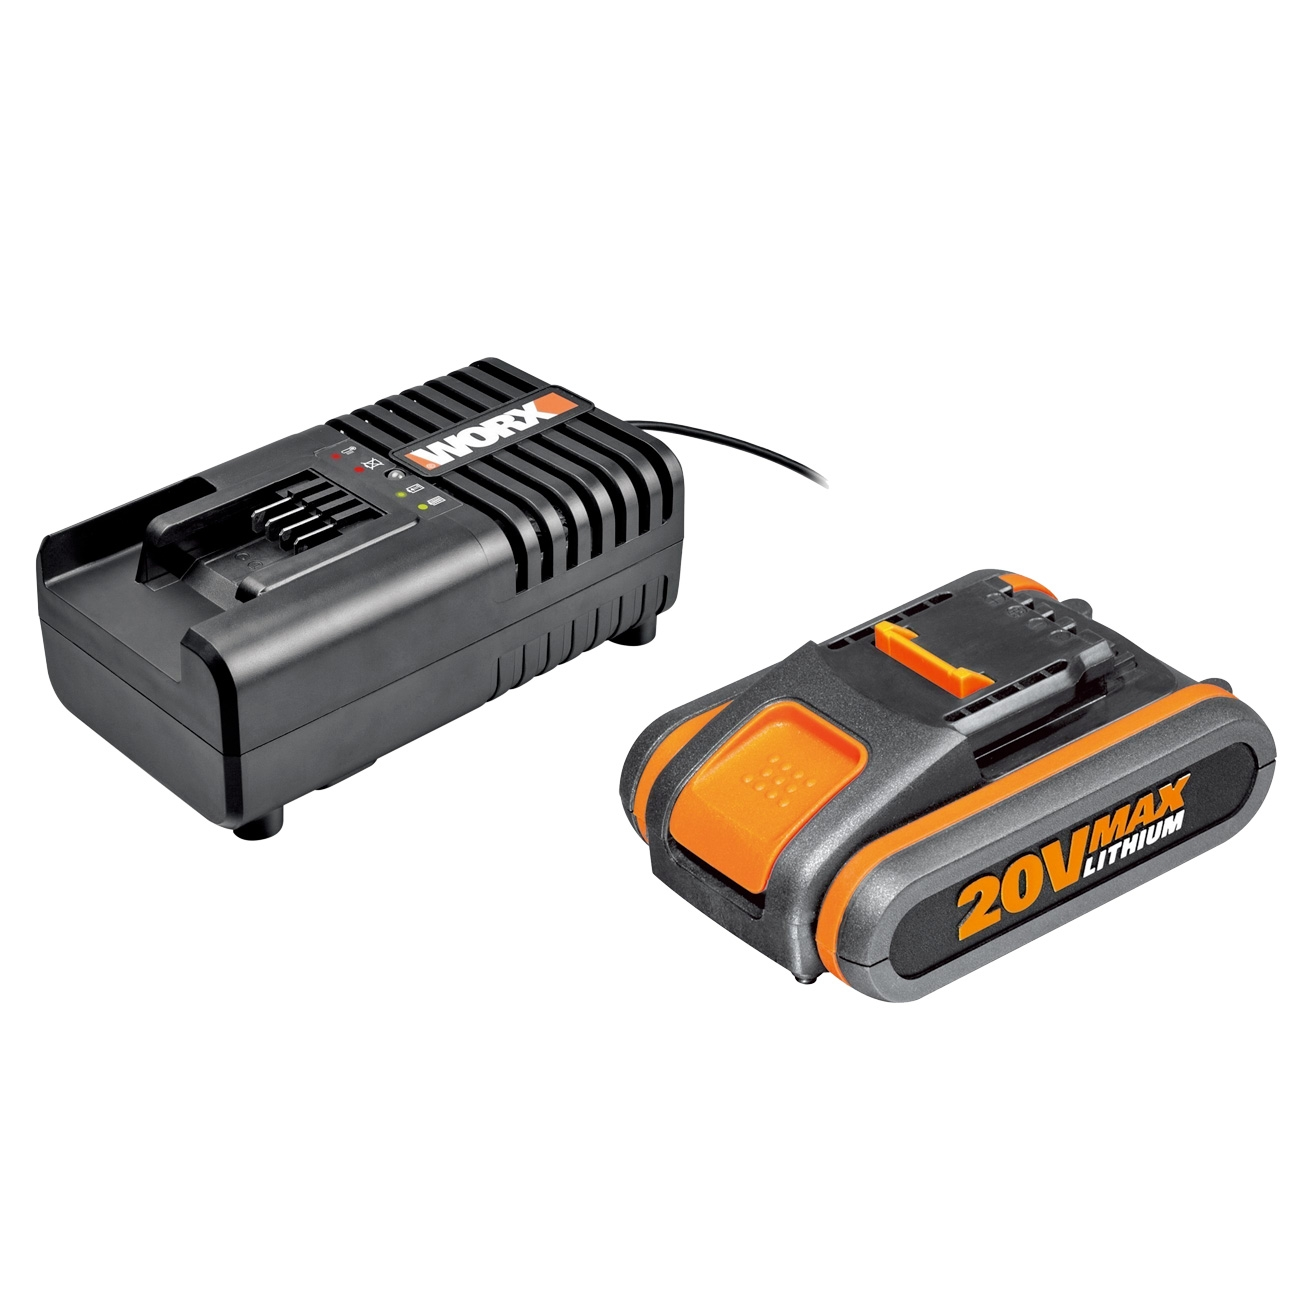 Worx WA3601 20V battery and charger set